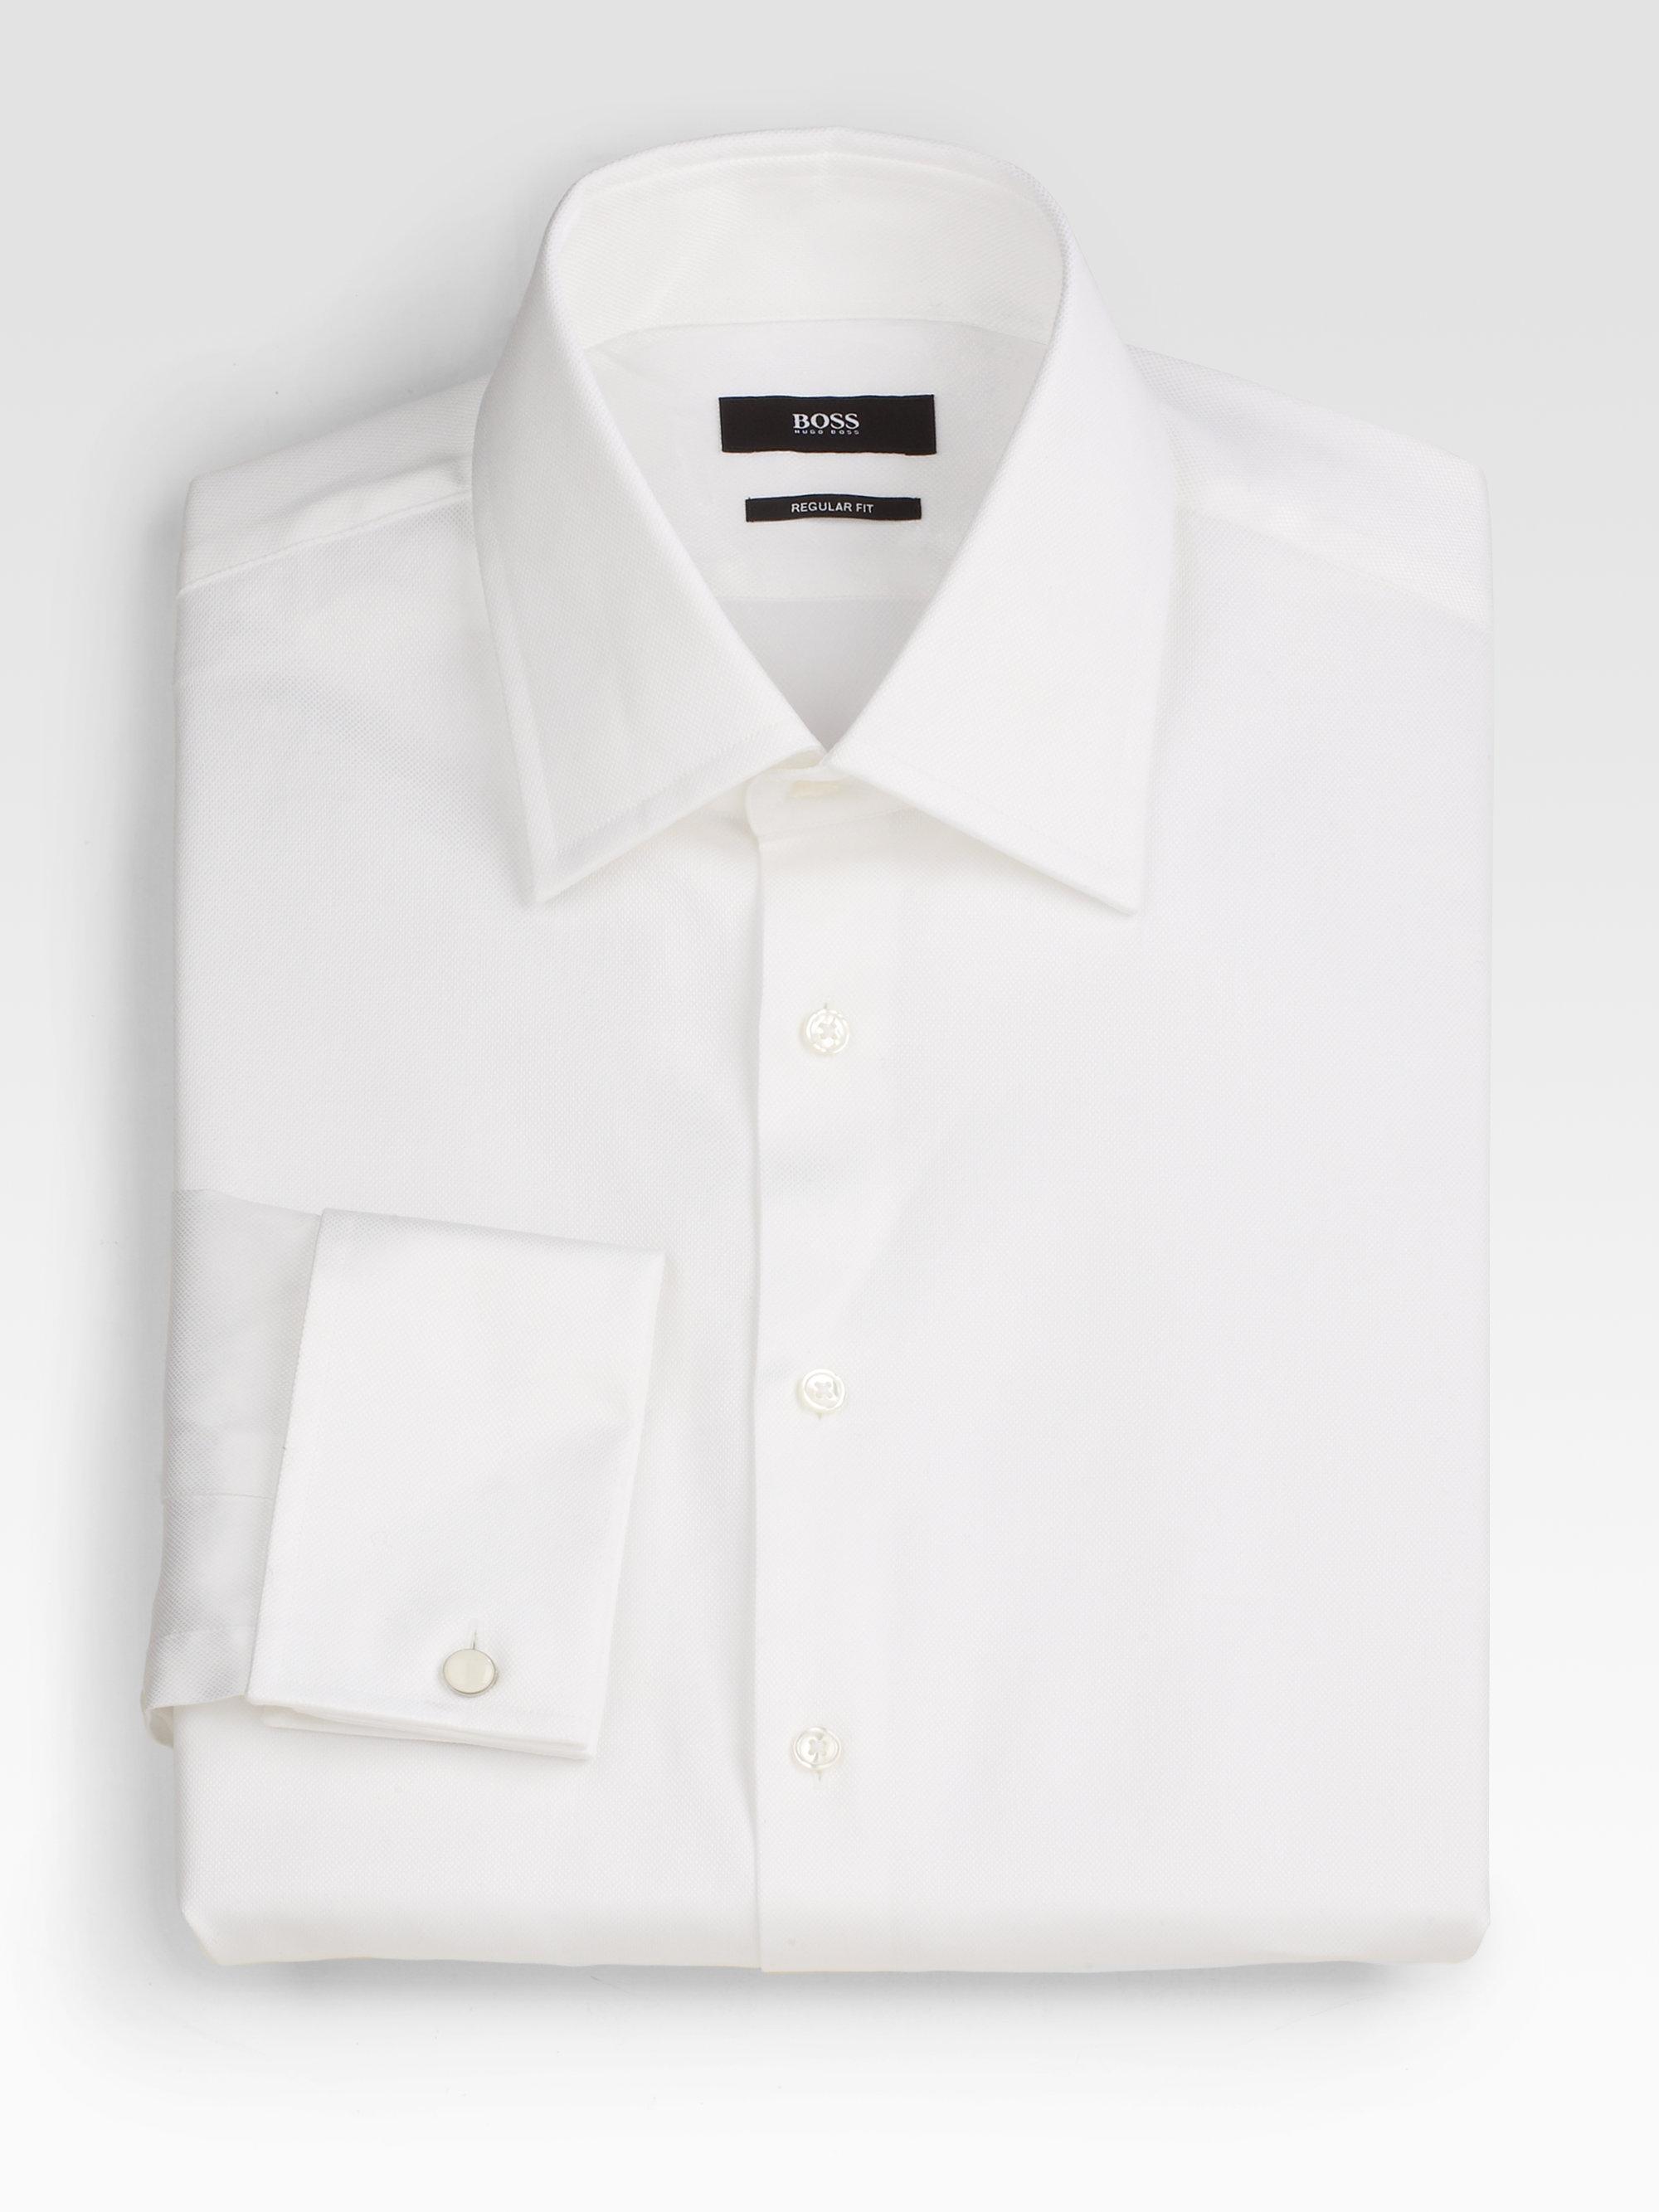 boss by hugo boss sharp fit french cuff dress shirt in